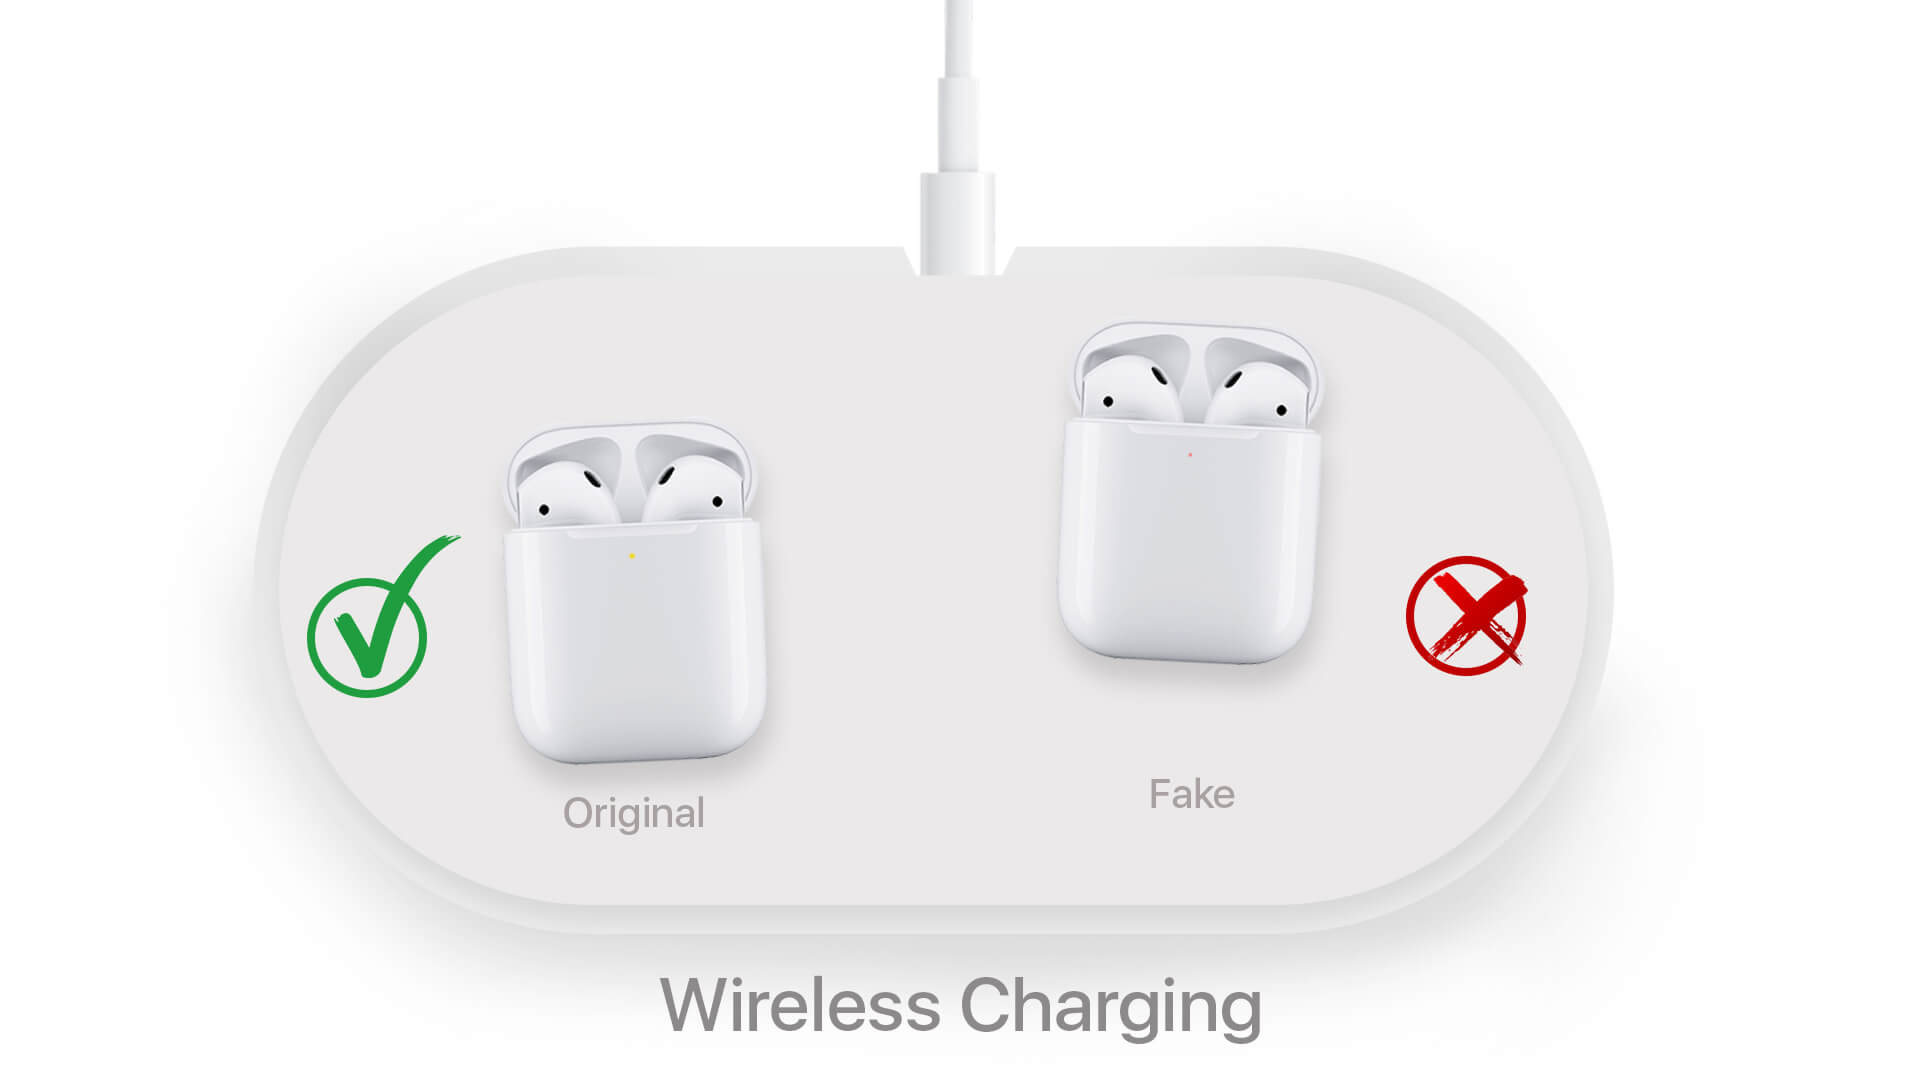 Wireless Charging to Identify Original Apple Wireless Airpods